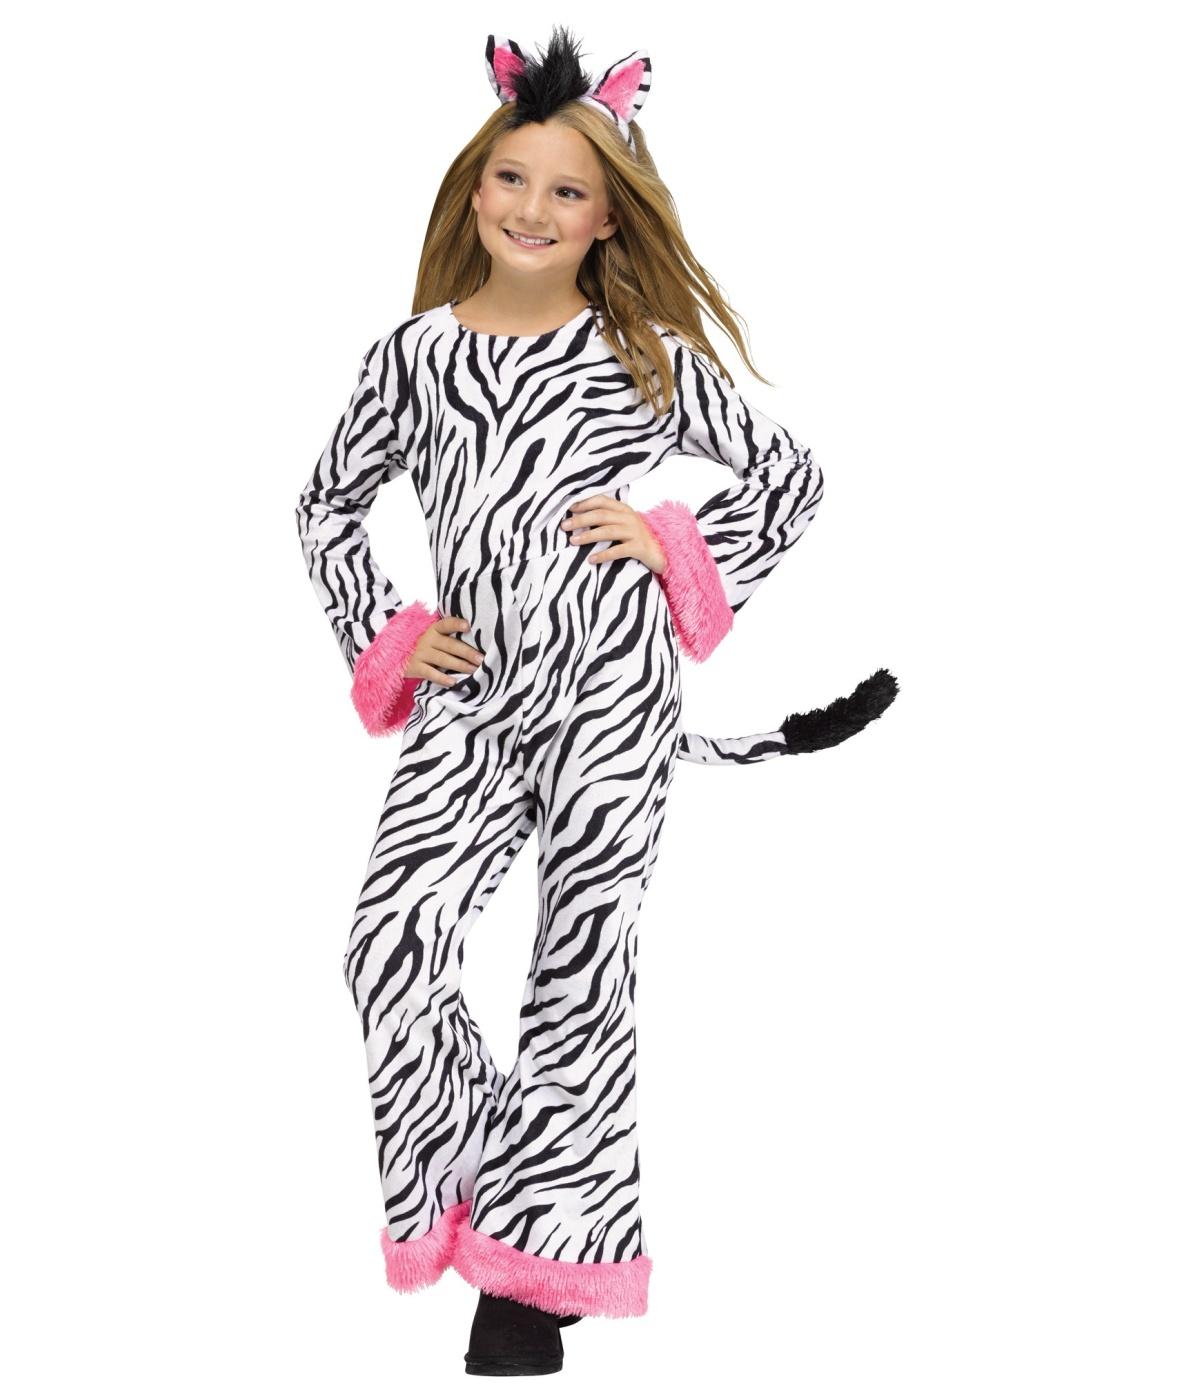 Cool Stripes Zebra Girls Costume Animal Costumes